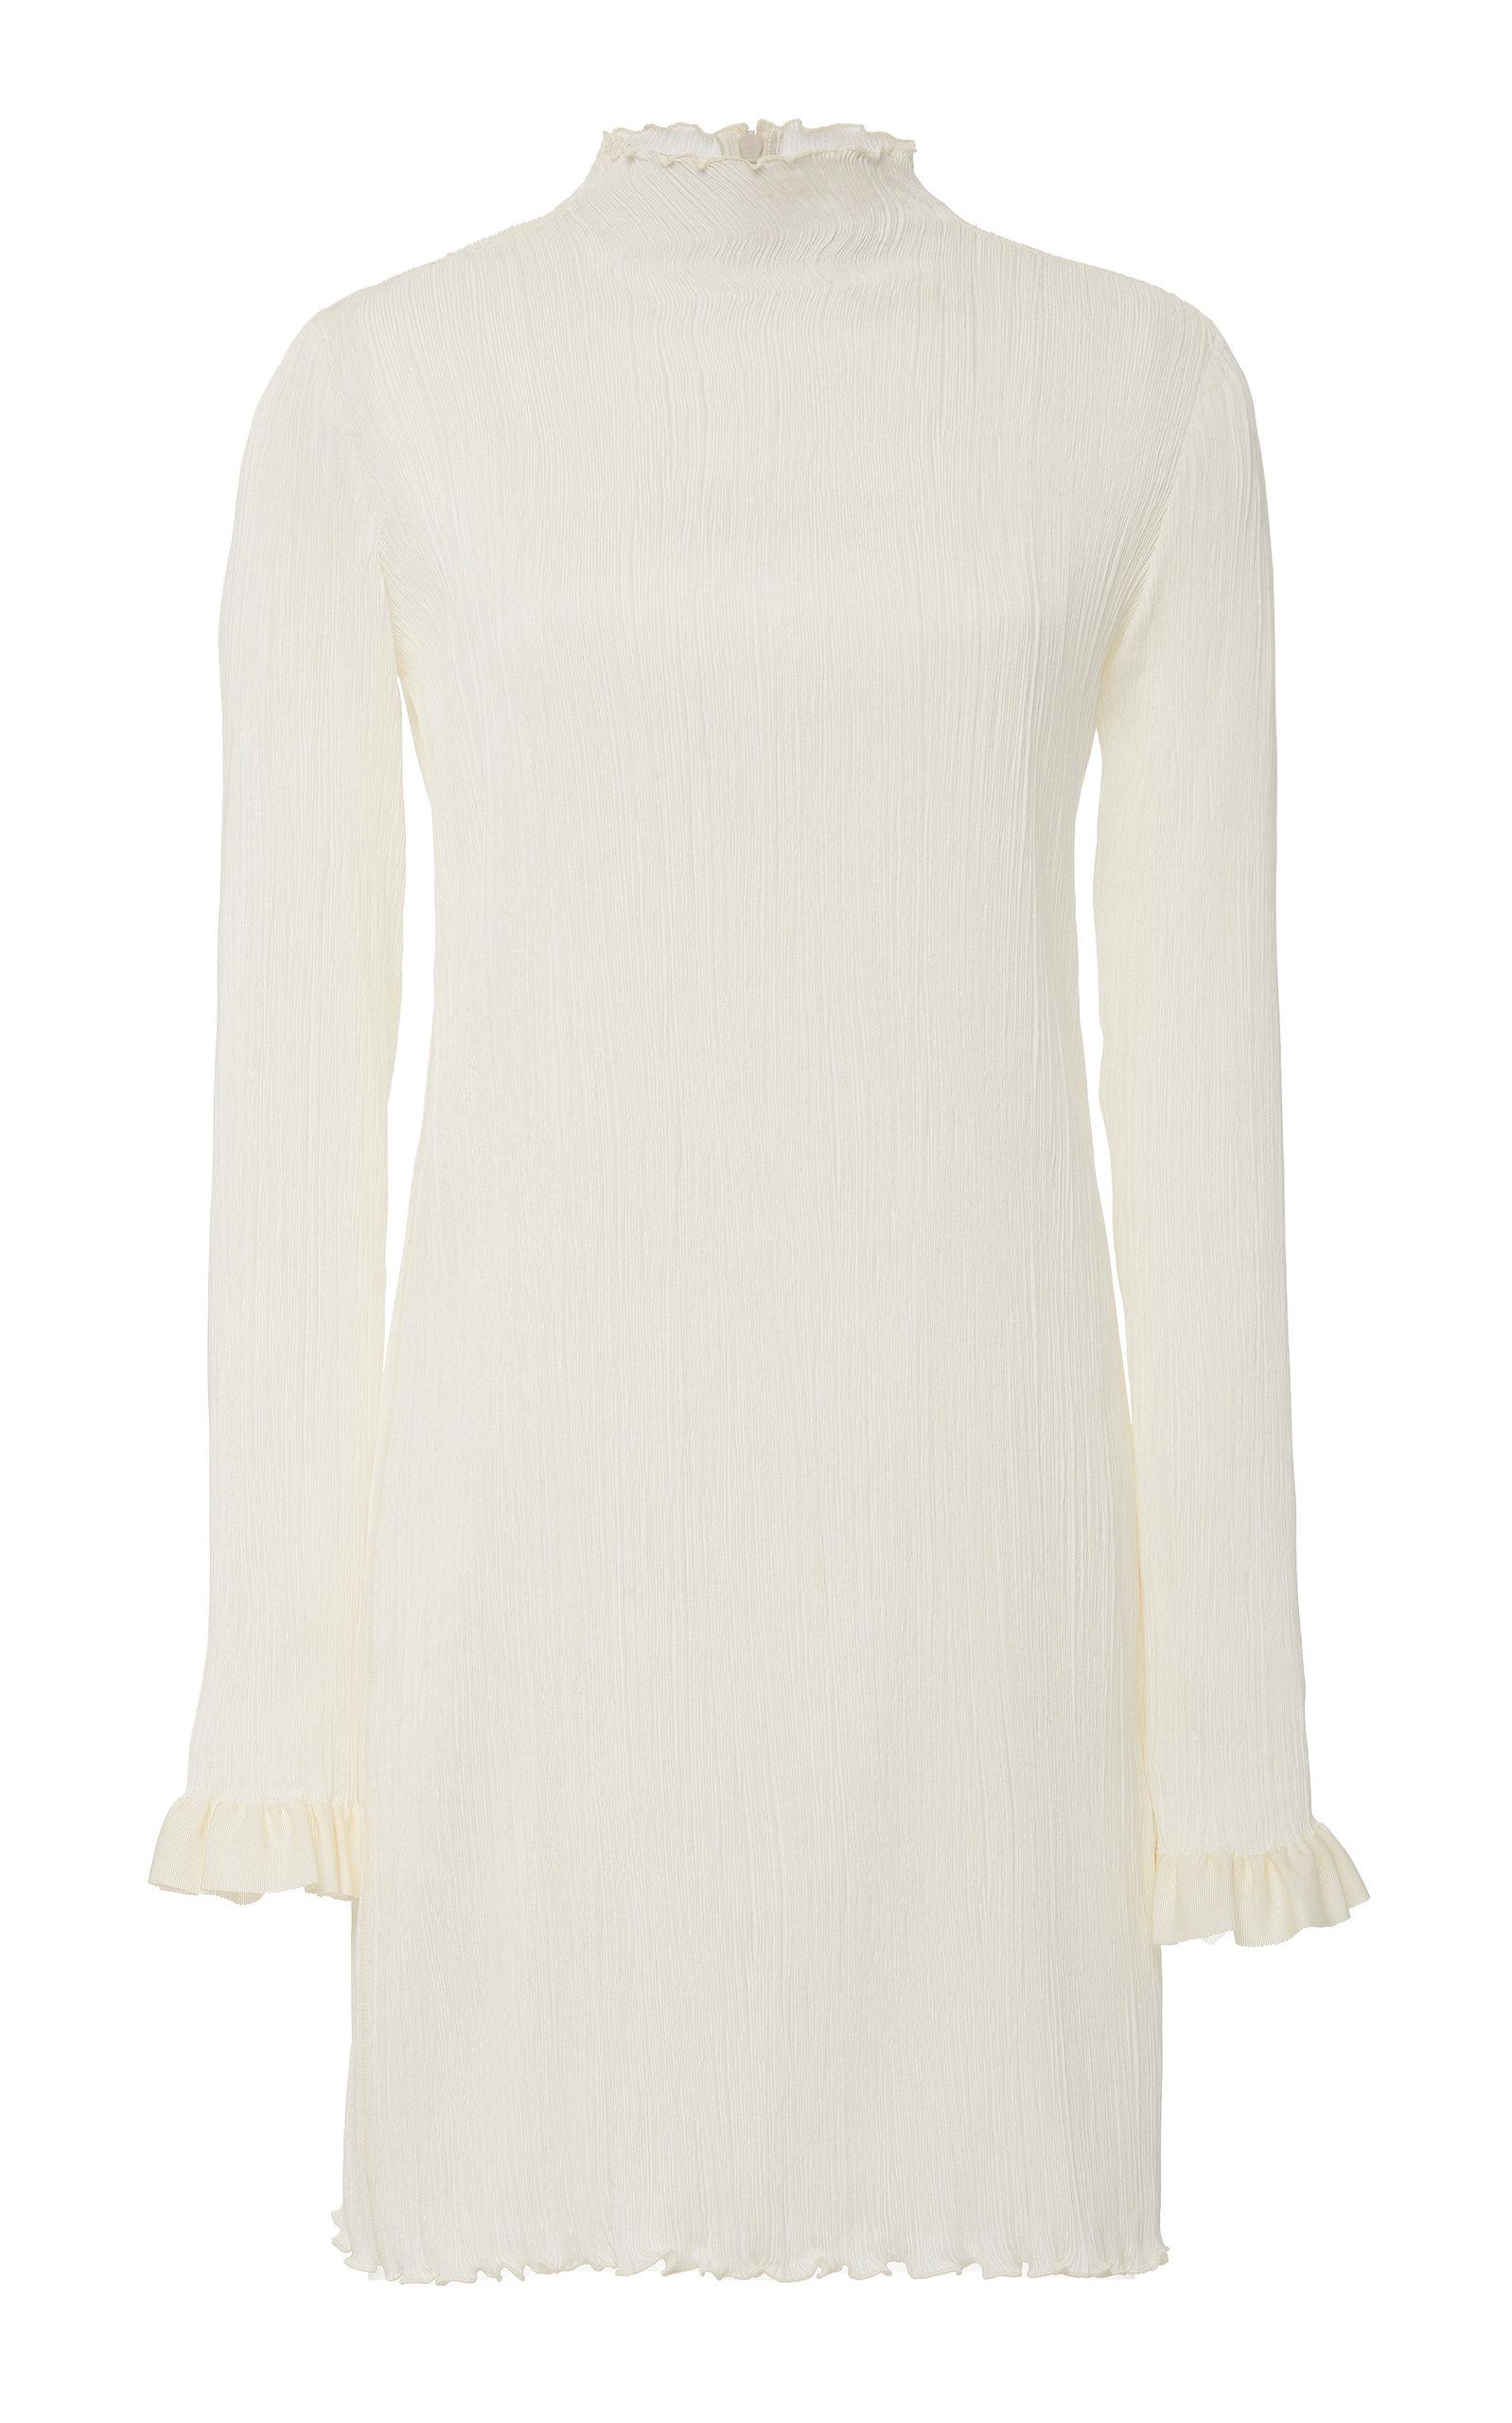 Danielle Frankel Jamie High-neck Silk Mini Dress In White